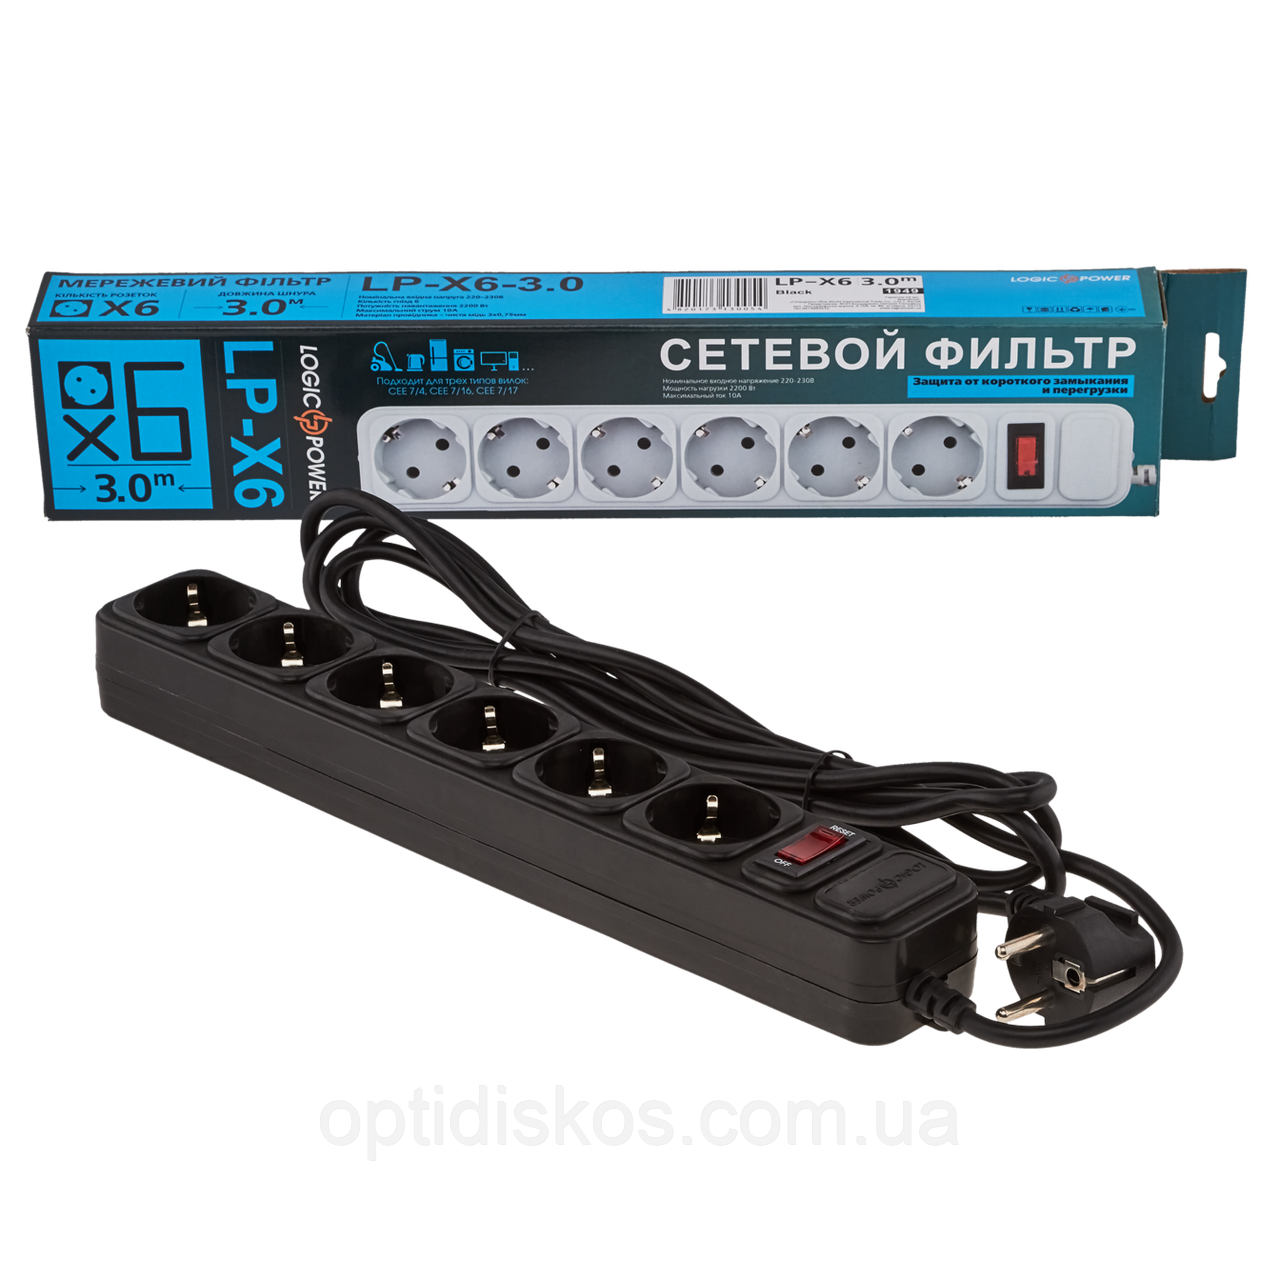 Сетевой фильтр  LogicPower LP-X6, 6 розеток, 3м